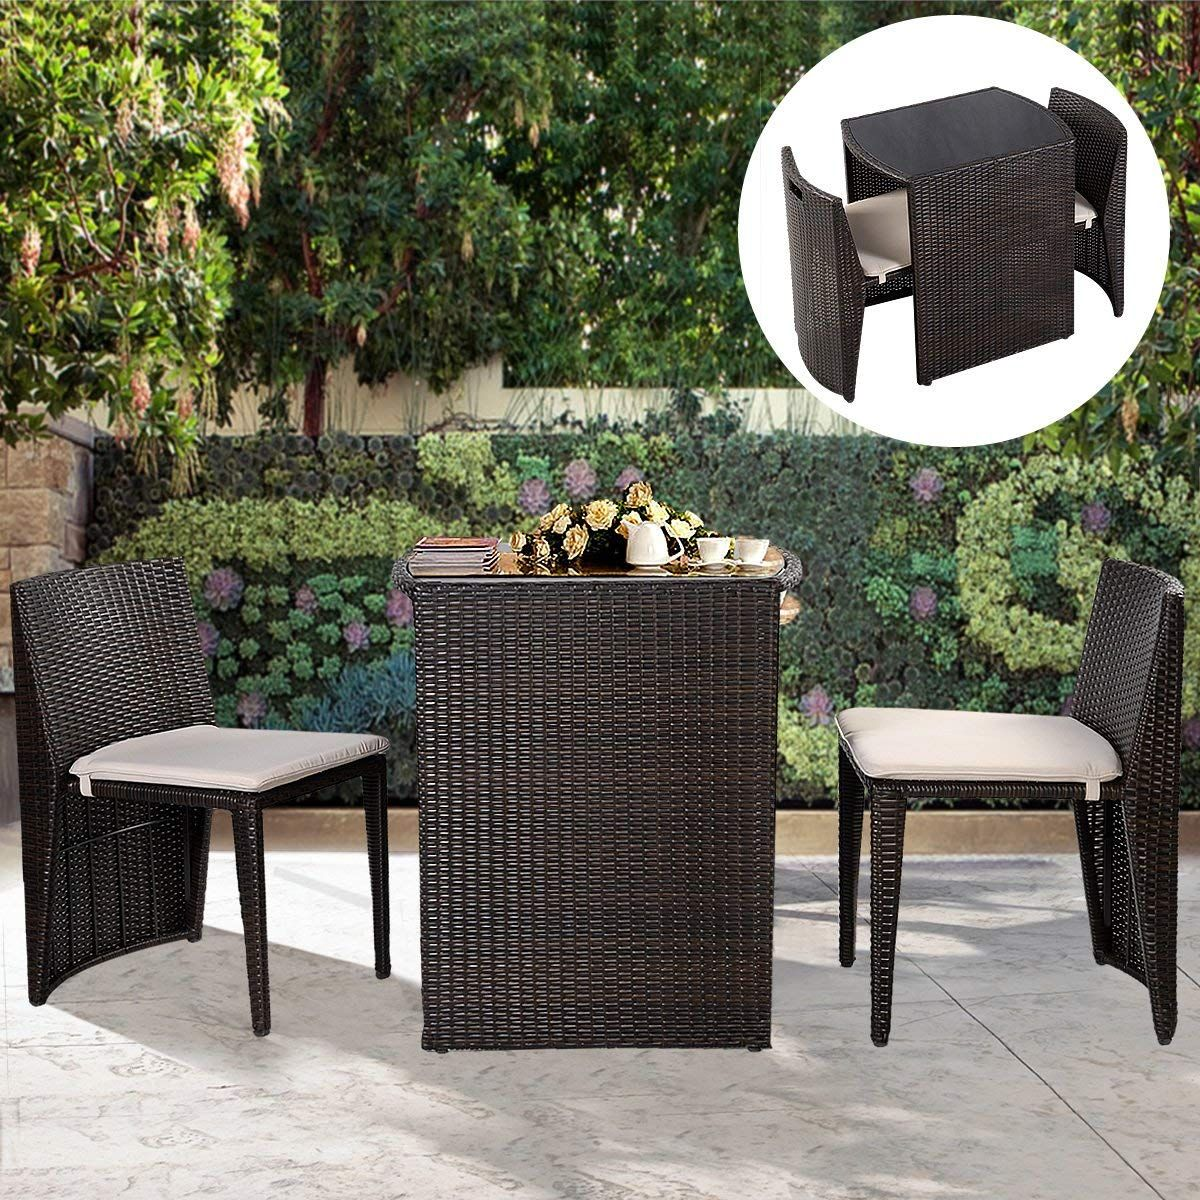 Costway Rattanmobel Polyrattan 3tlg Gartenmobel Lounge Set